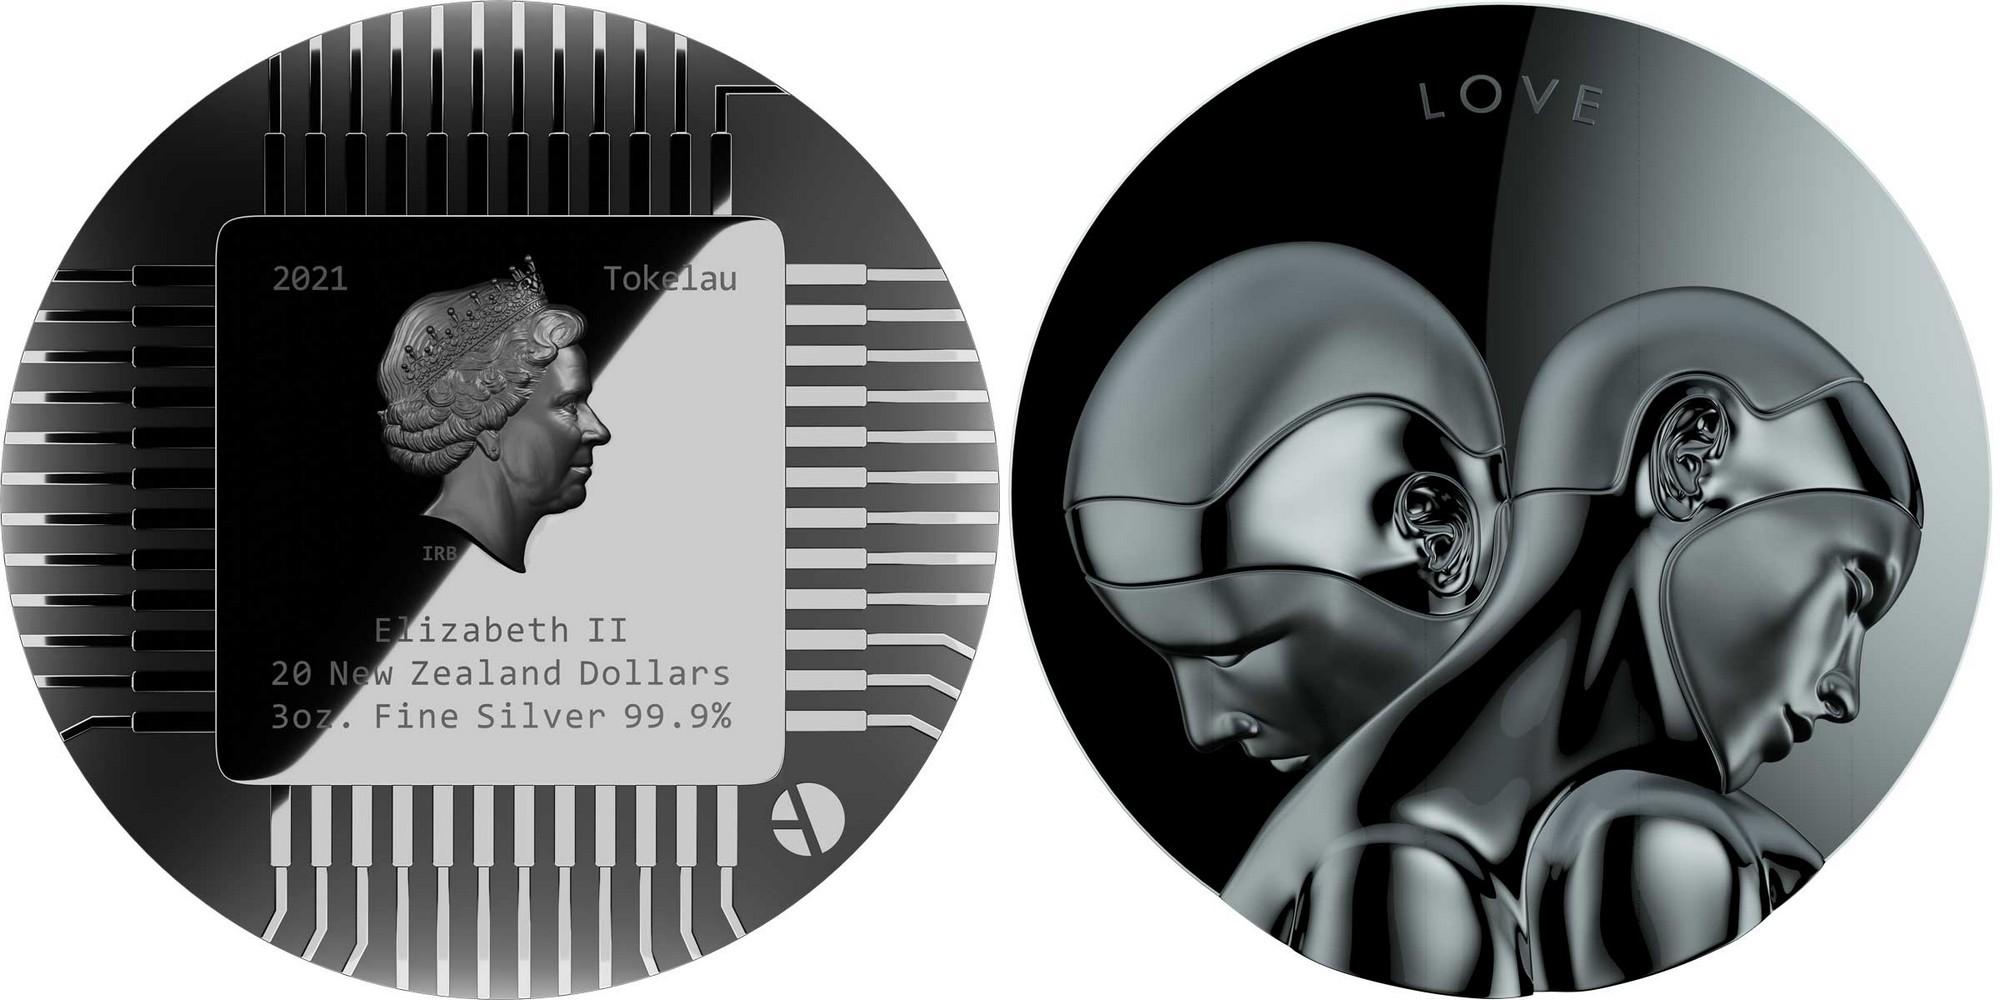 tokelau-2021-robots-amour-99-ex